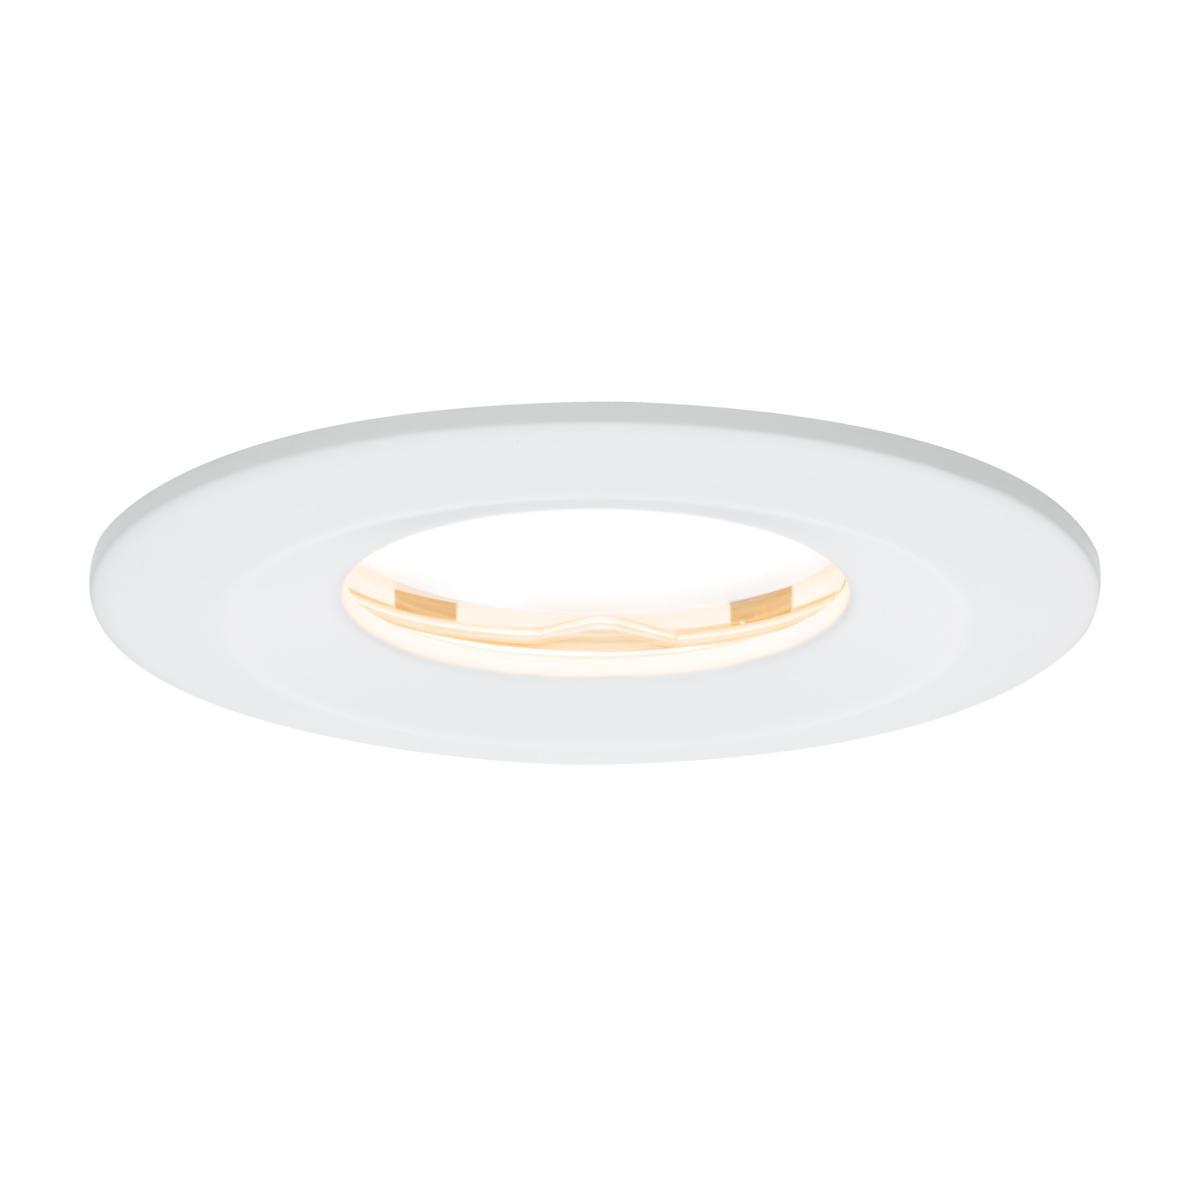 spot led ip65 encastrable dimmable slim coin 6 8w 230v paulmann 93881. Black Bedroom Furniture Sets. Home Design Ideas